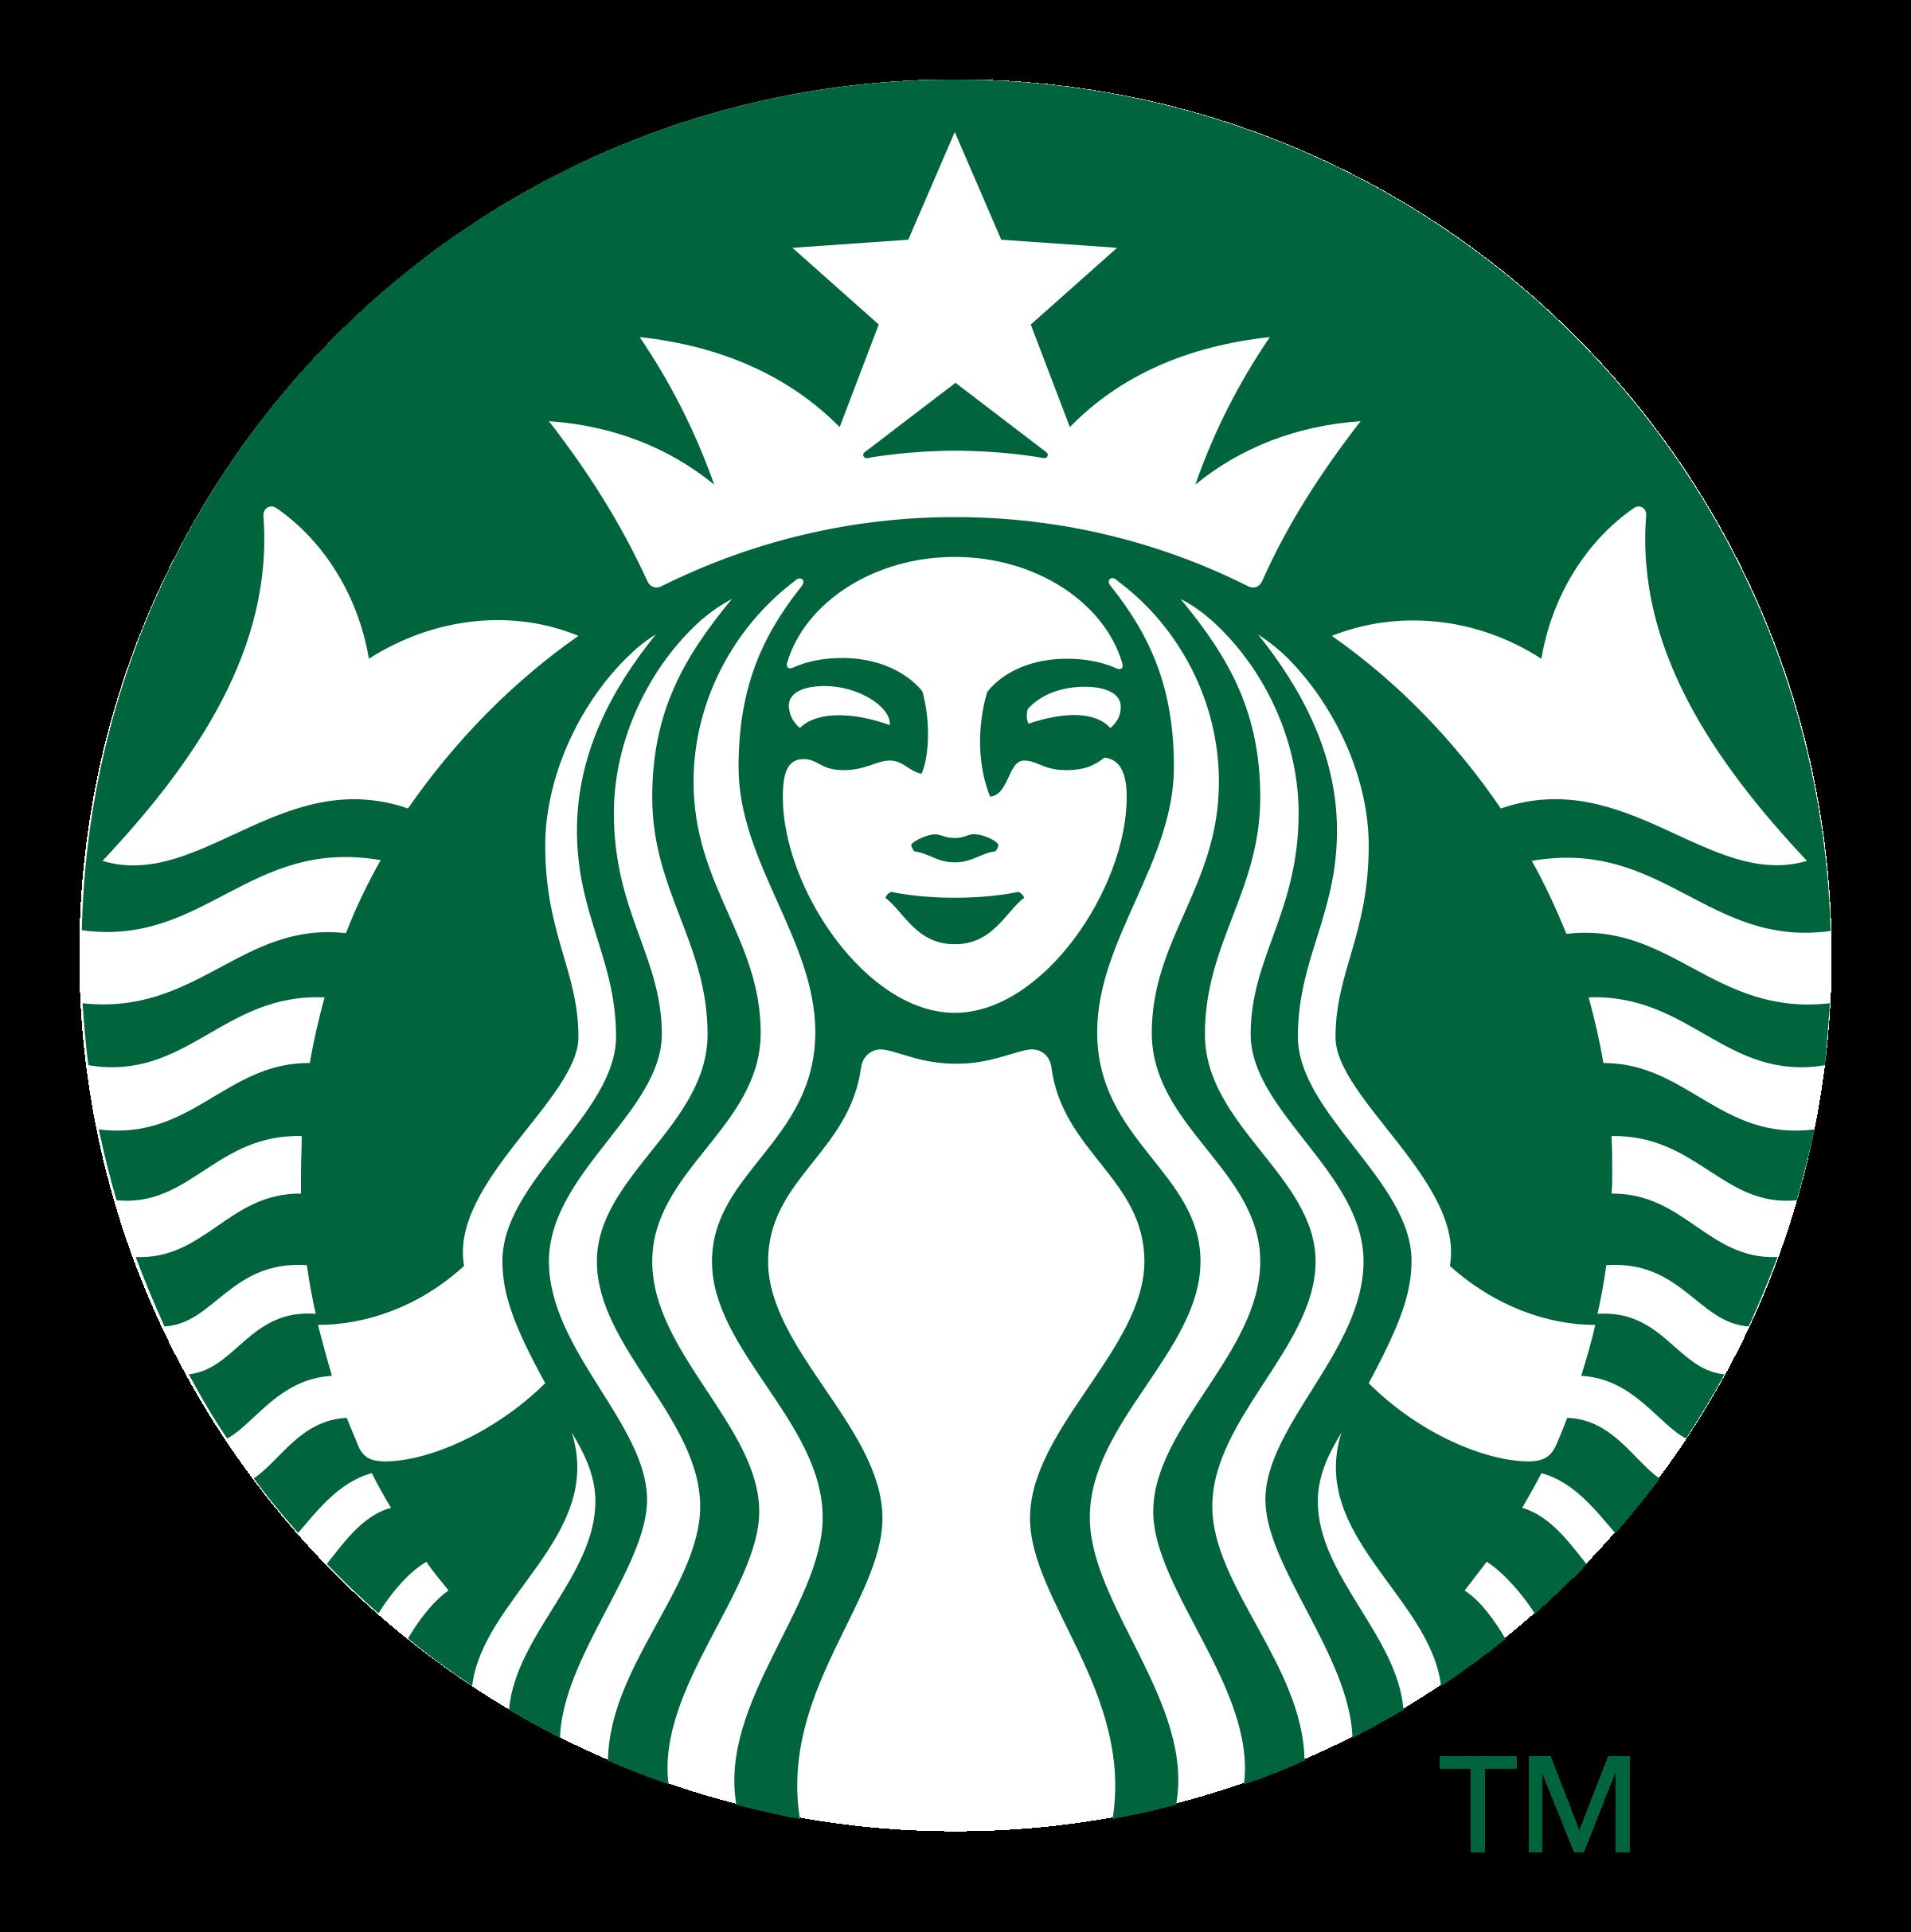 https://www.apexanalytix.com/sites/default/files/revslider/image/starbucks-logo-png-transparent_0.png